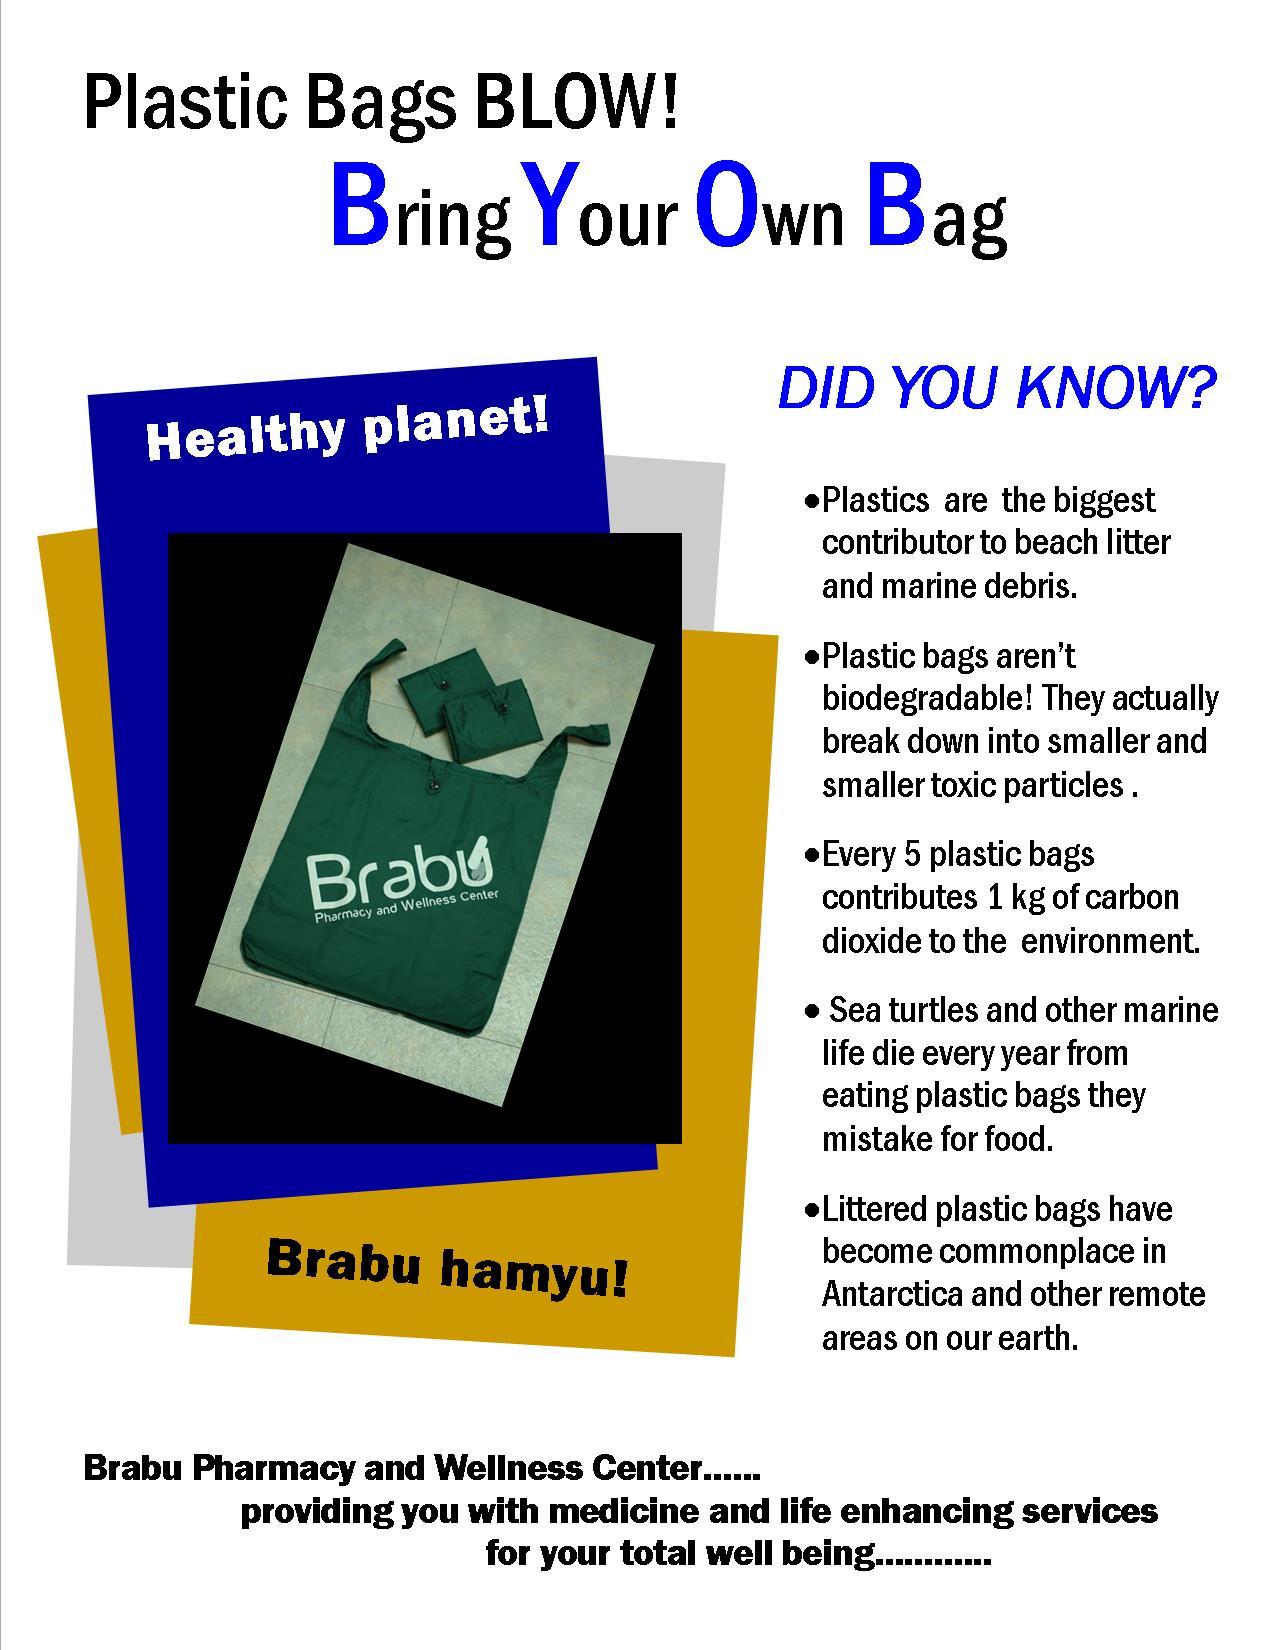 Plastic Bags Blow.jpg